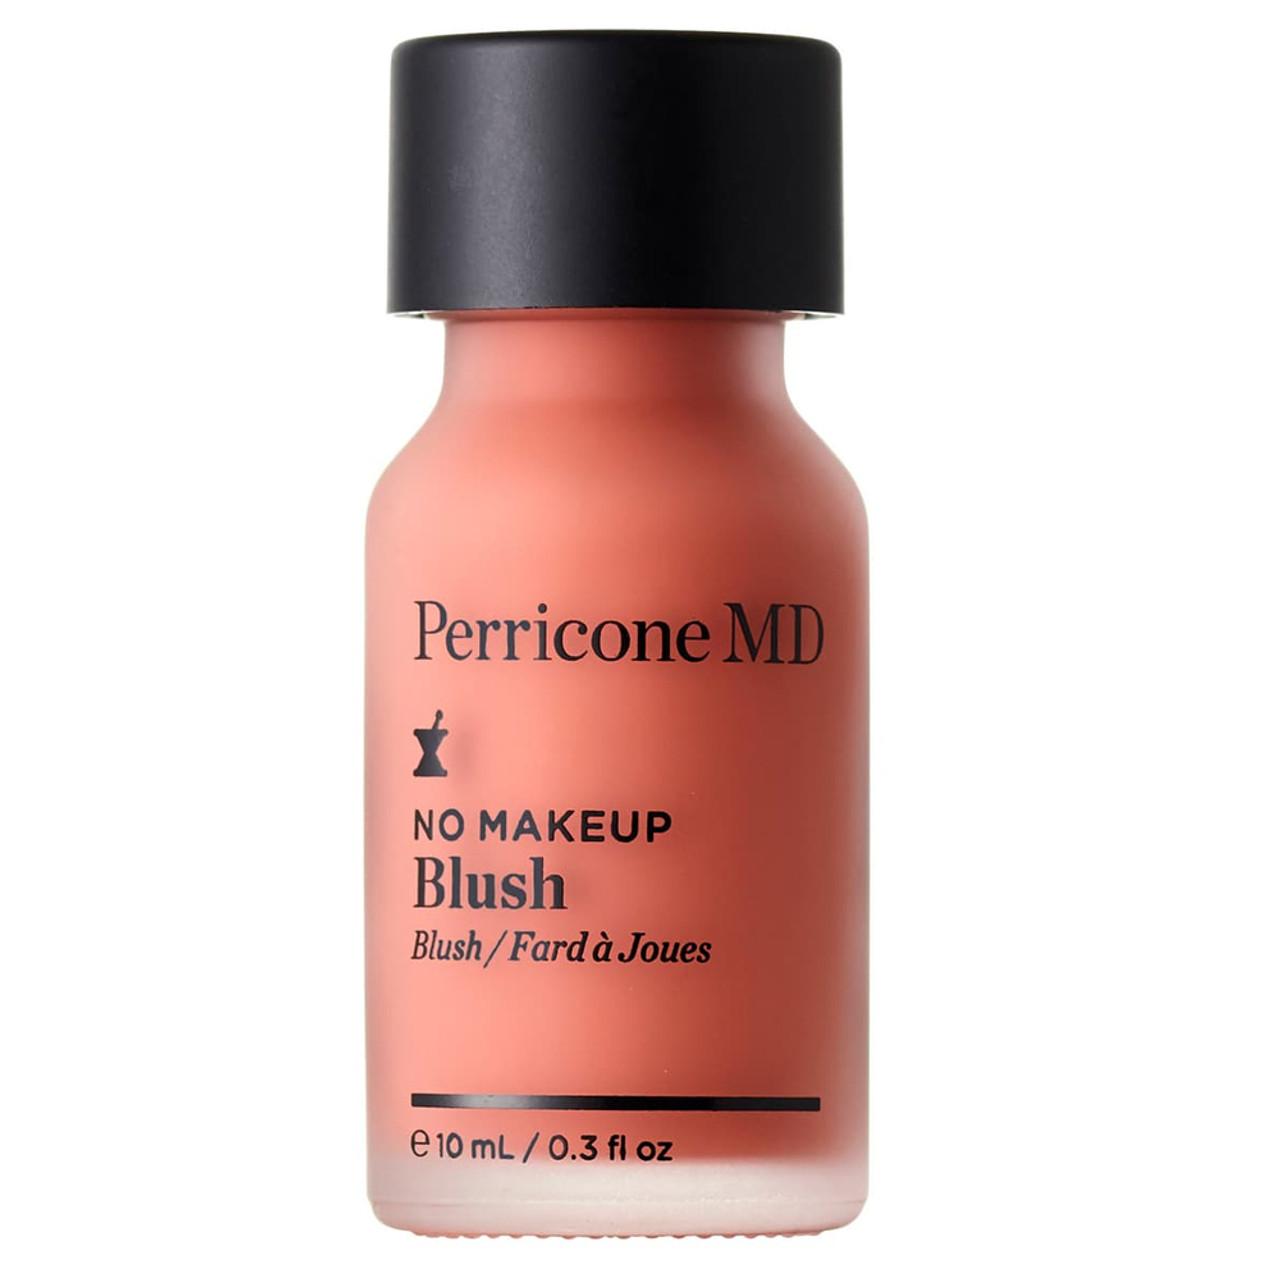 Perricone MD No Makeup Blush BeautifiedYou.com